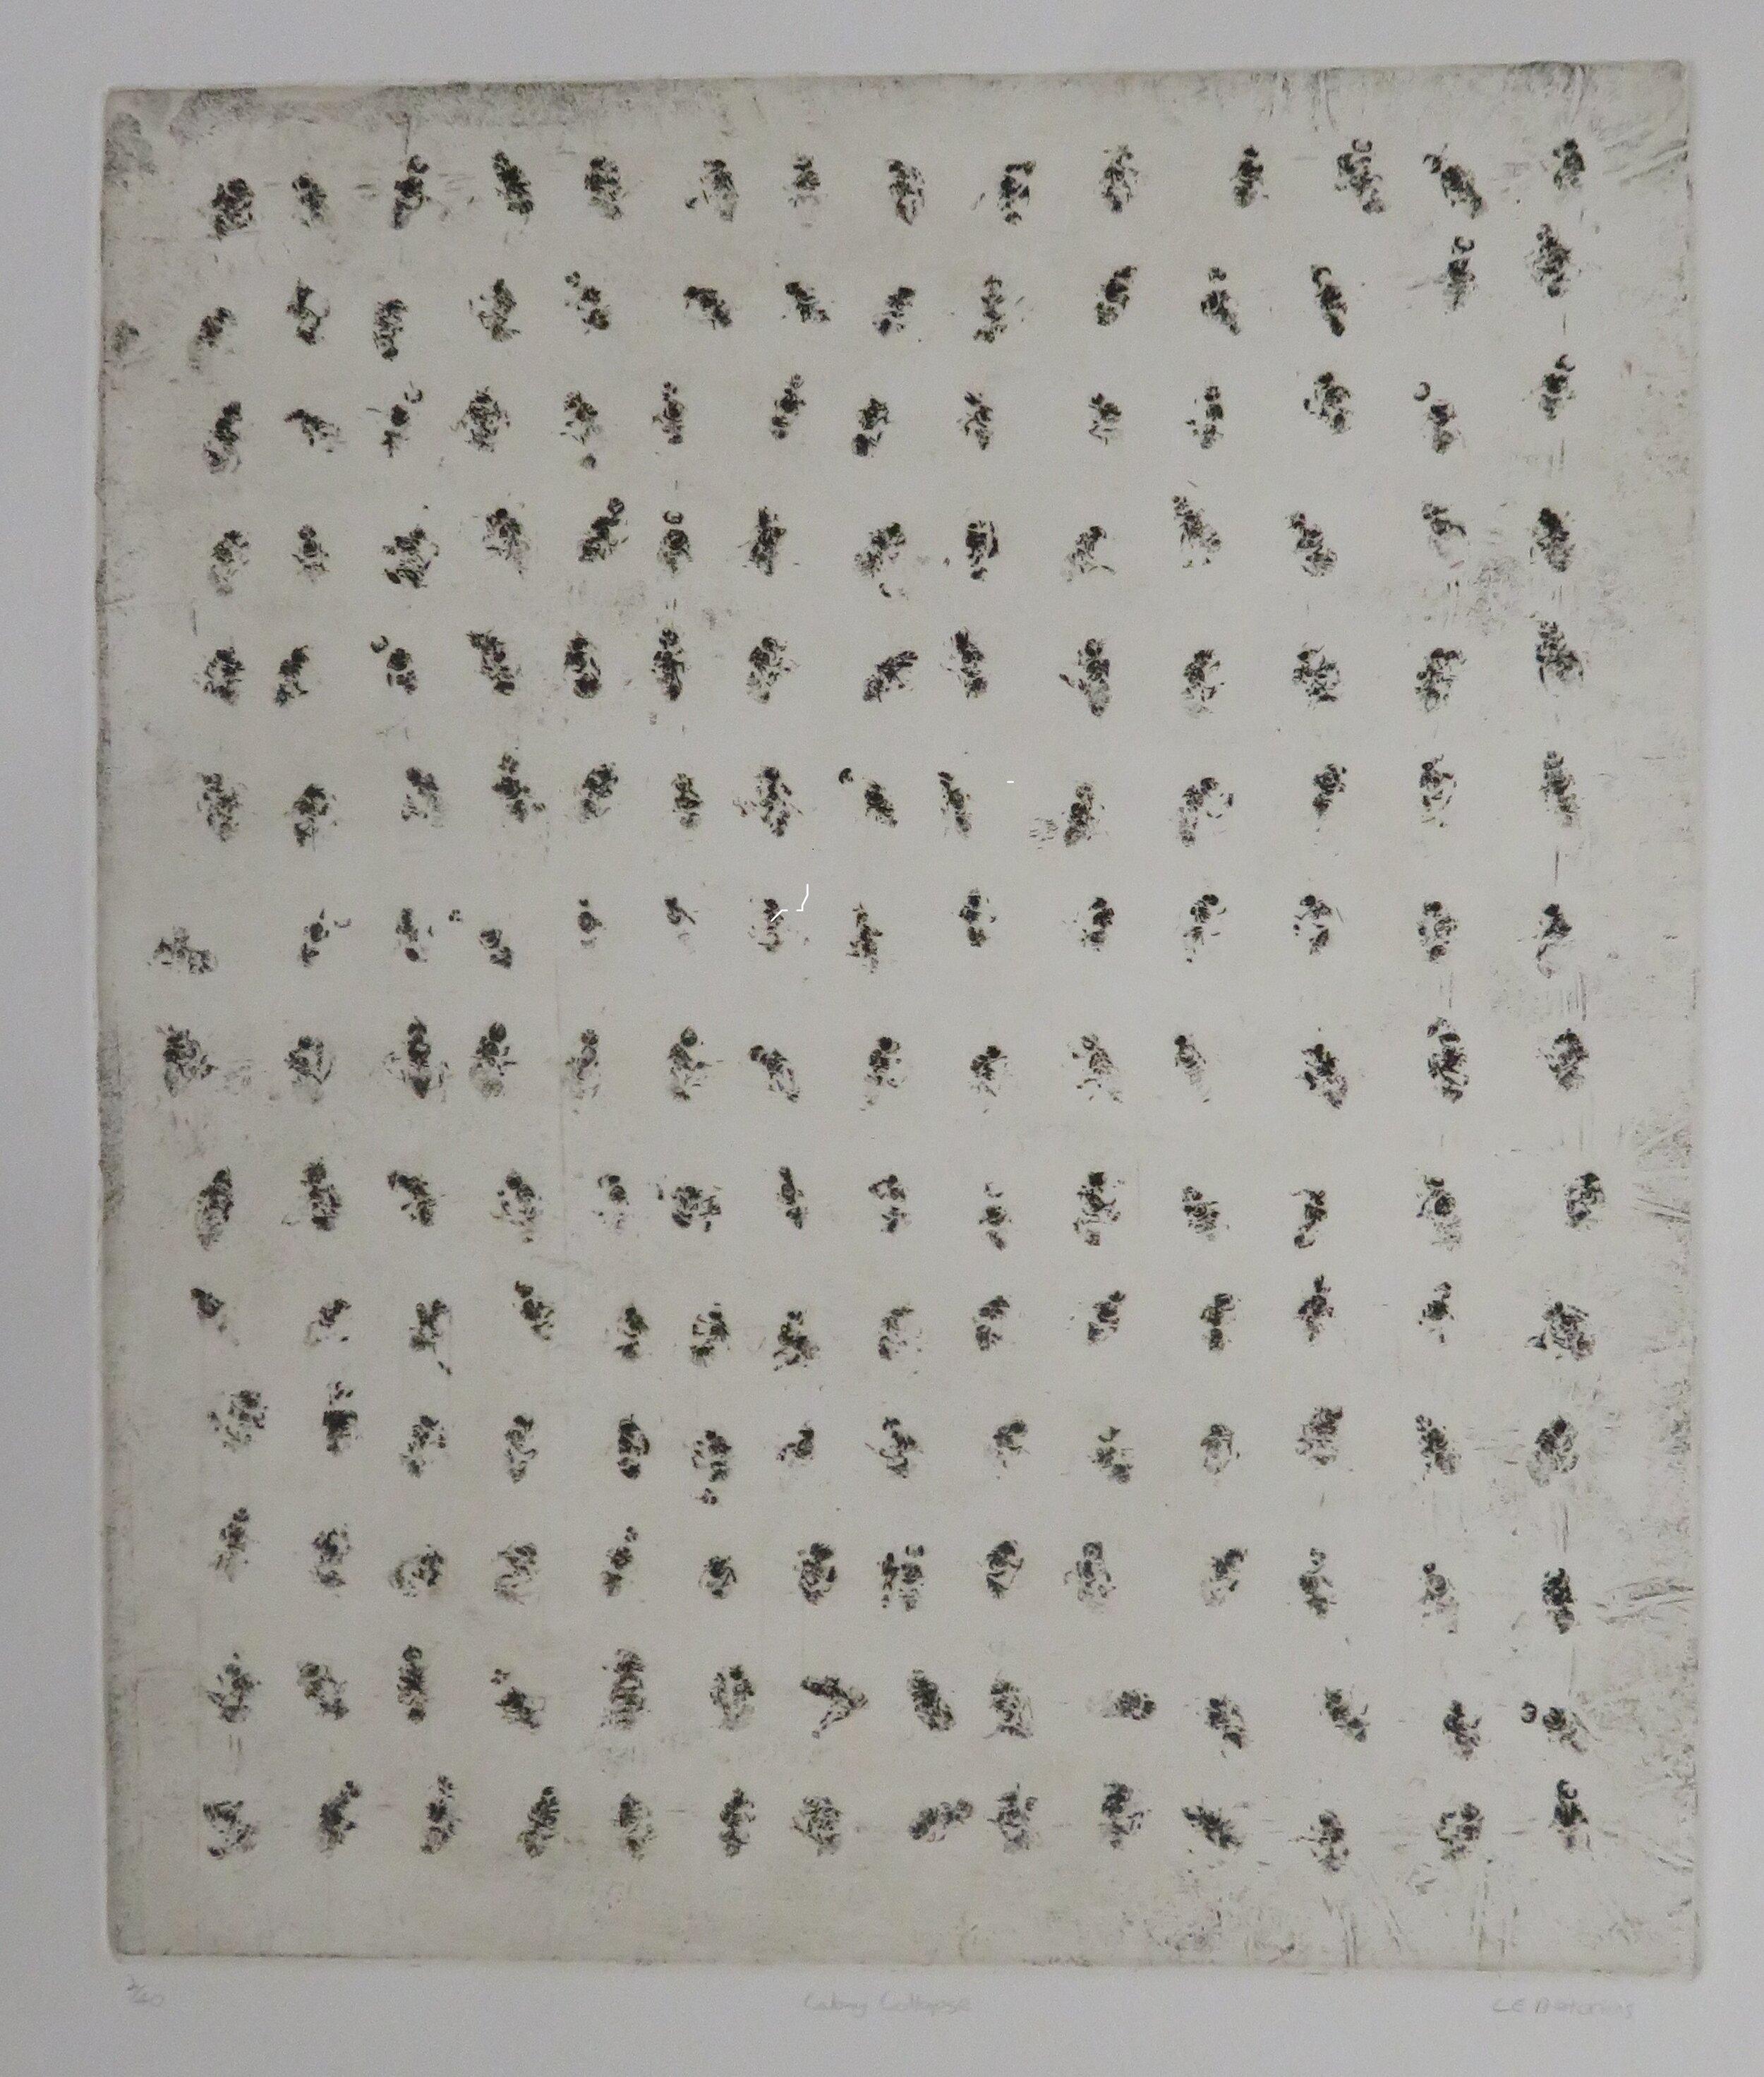 57b  Eloff Pretorius  Colony collapse  etching on paper